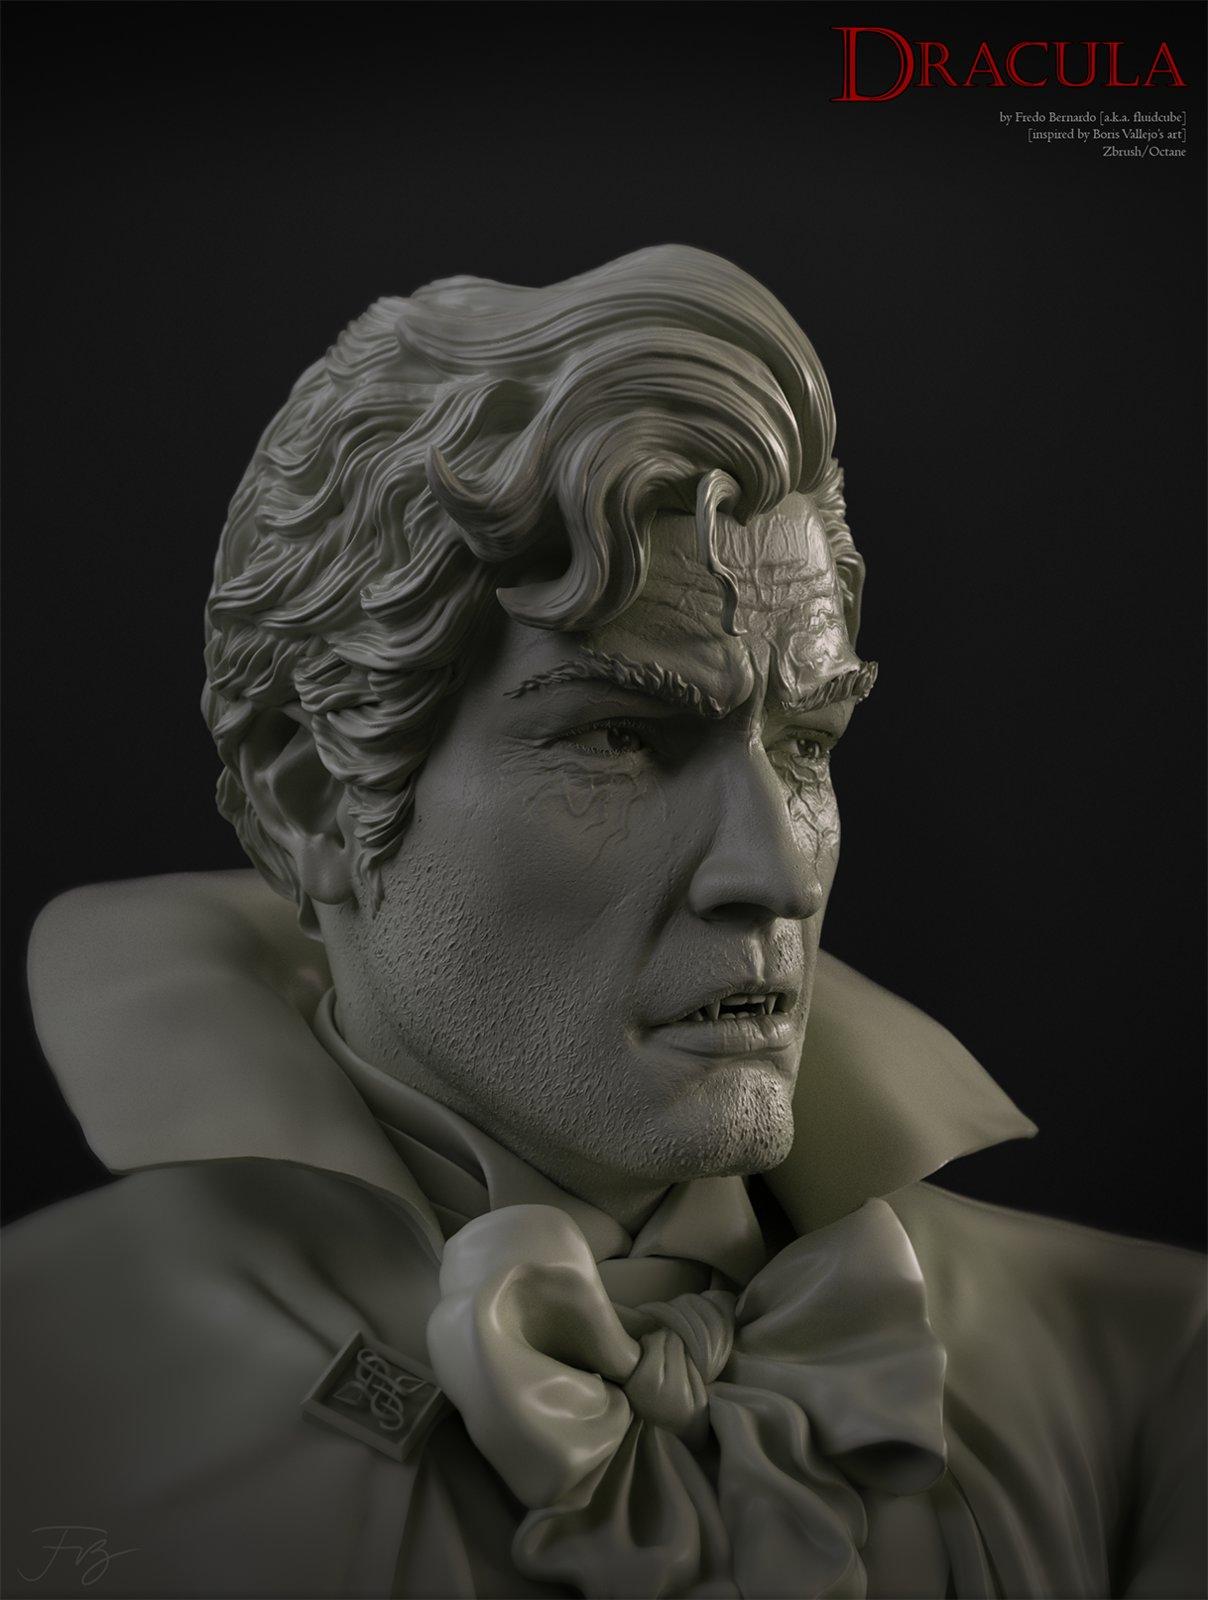 Dracula: Solo